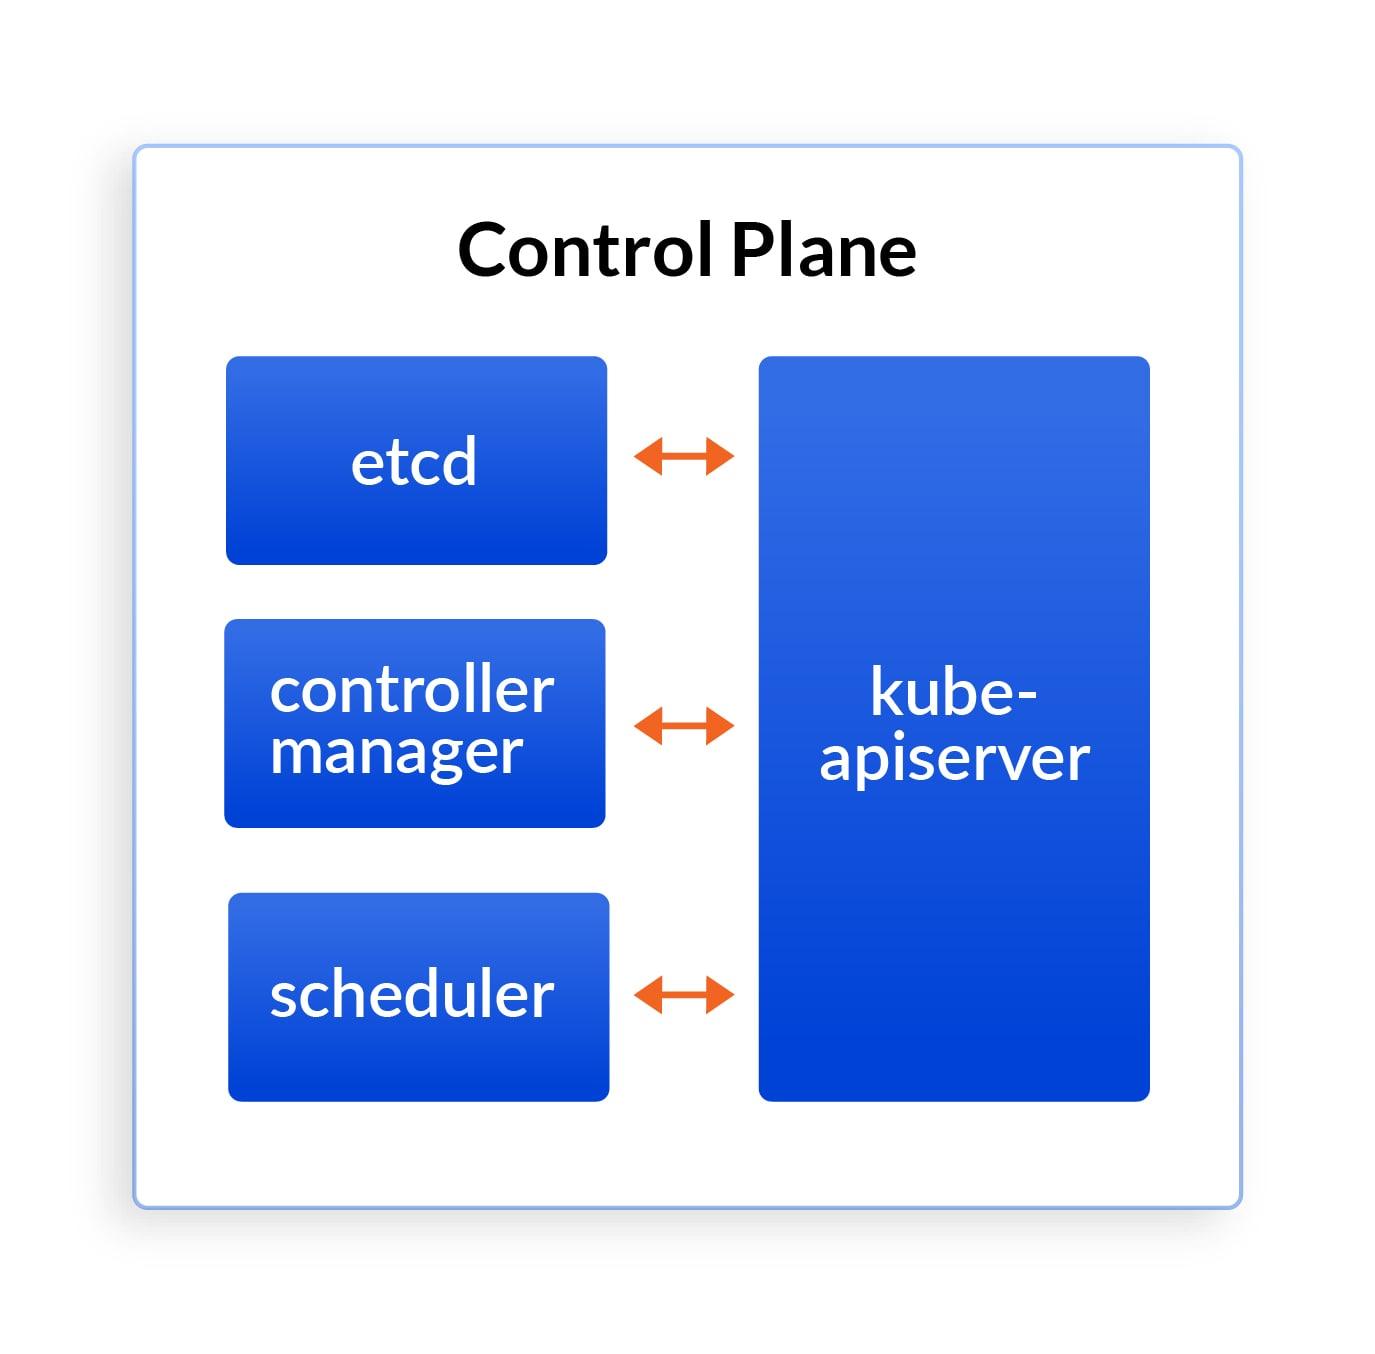 Kubernetes control plane